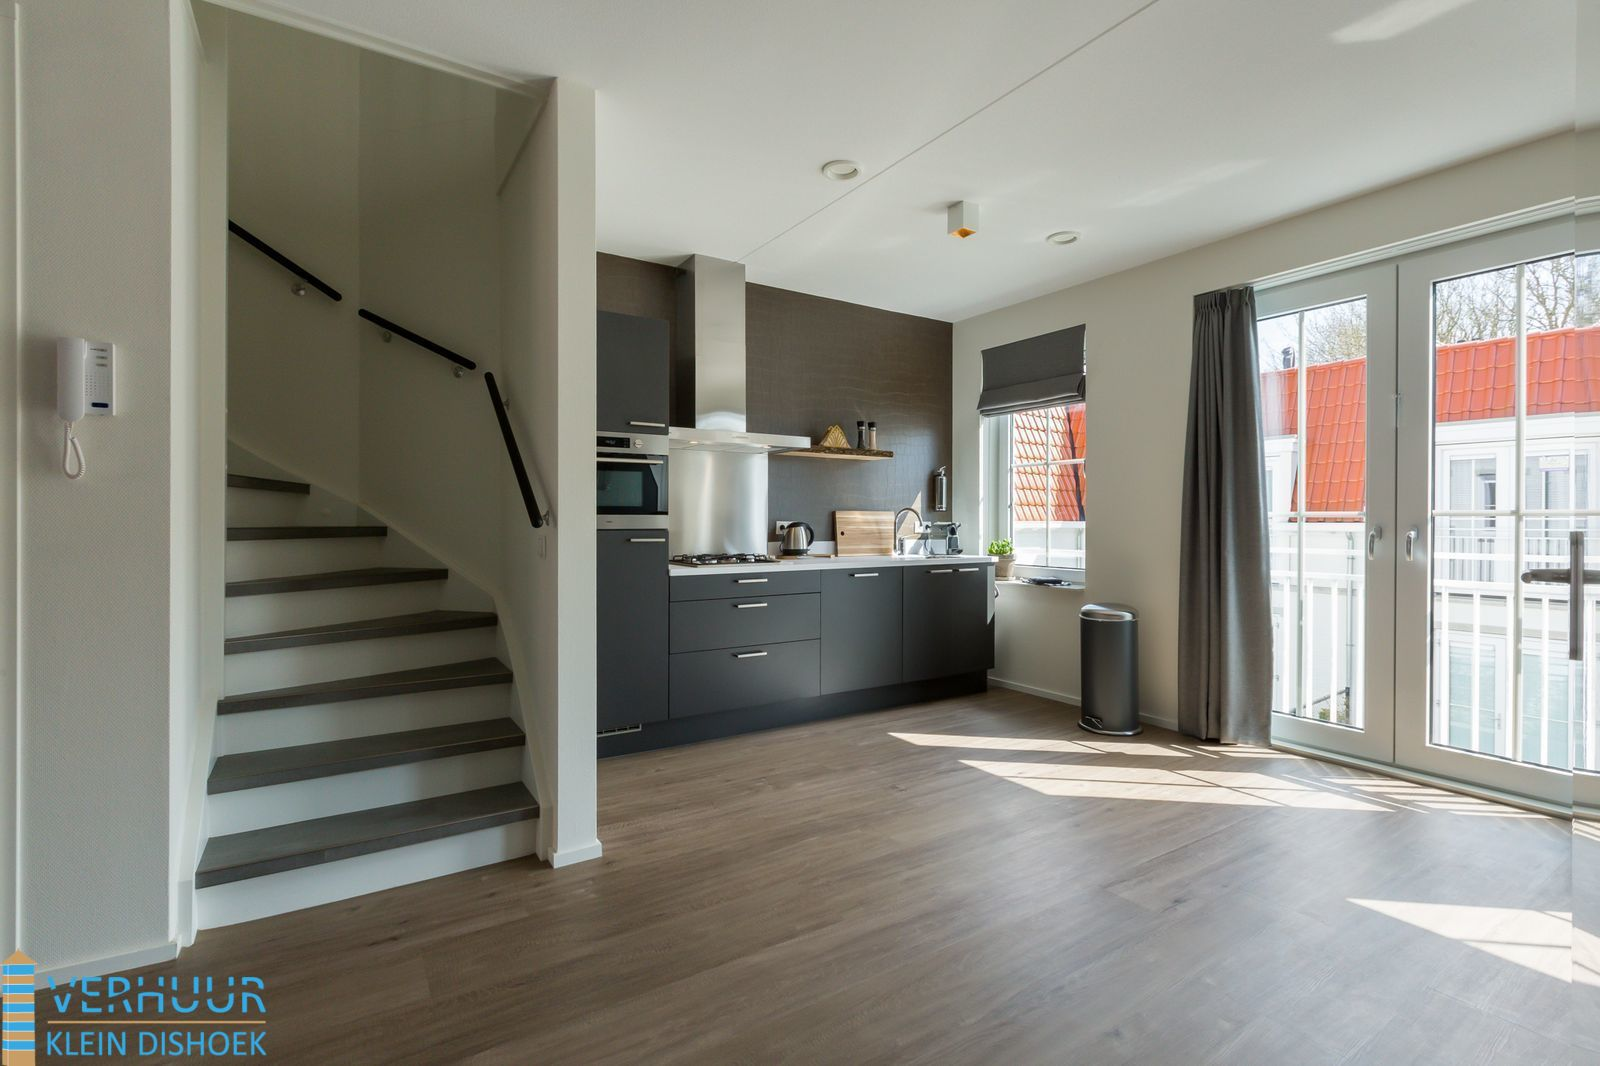 Appartement - Kaapduinseweg 13 | Dishoek 13F Luxe 6 personen